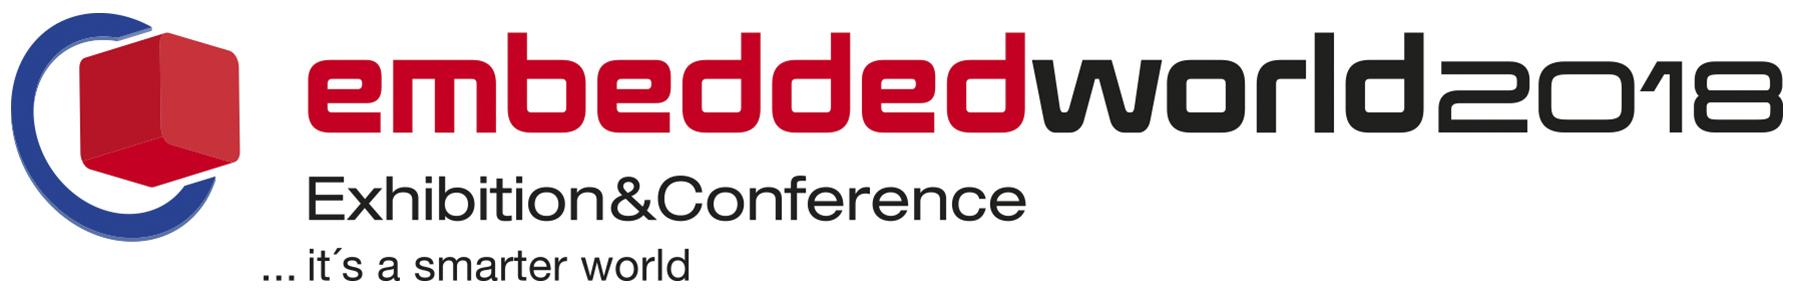 embeddedworld_2018_Logo_farbig_positiv_CMYK